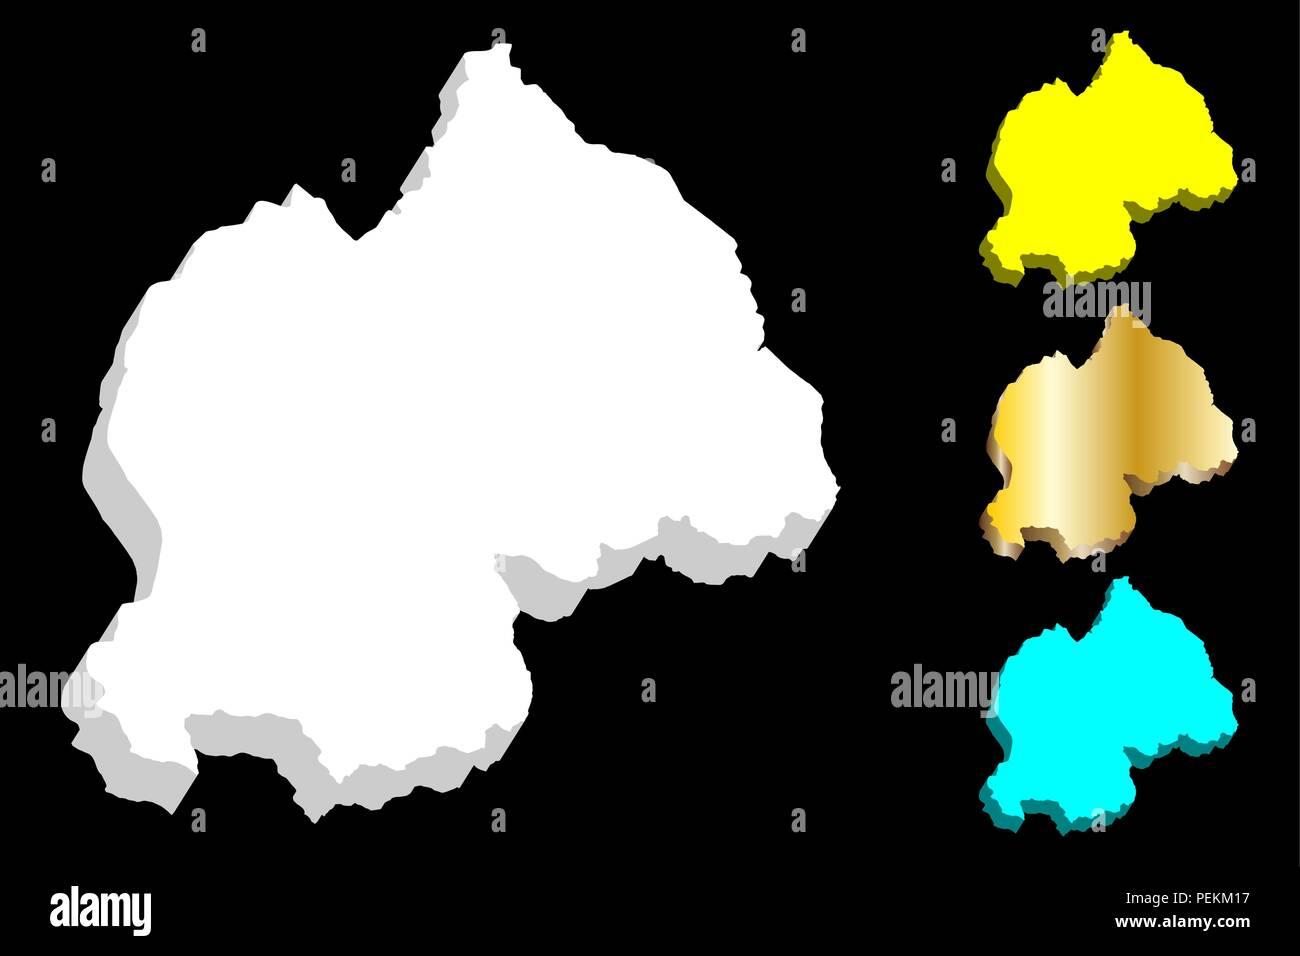 3D map of Rwanda (Republic of Rwanda) -  white, yellow, blue and gold - vector illustration - Stock Vector